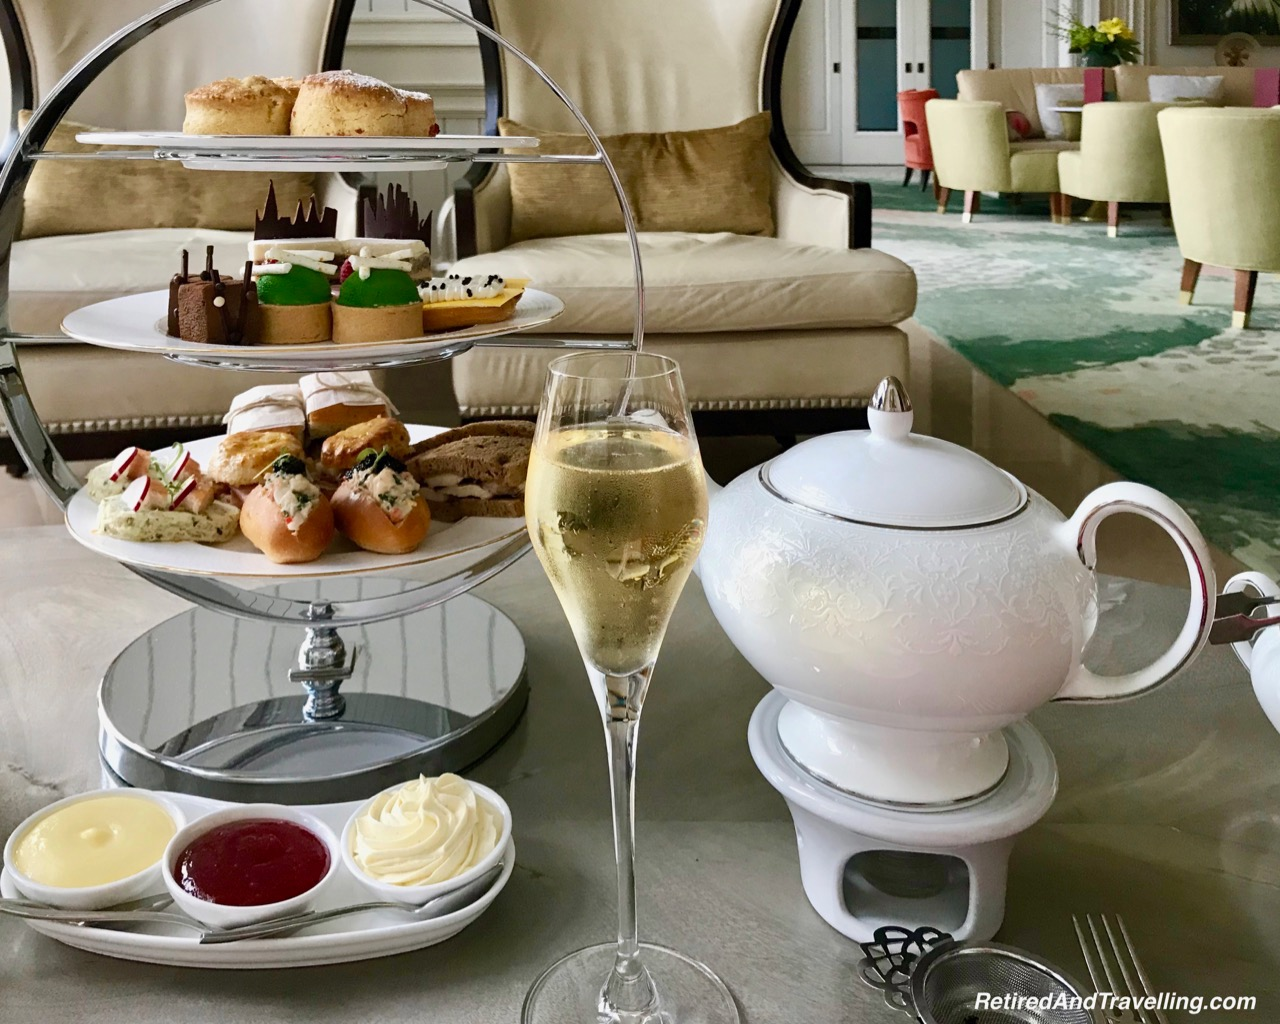 Tea Tray - Afternoon Tea At Ritz-Carlton Grand Cayman.jpg